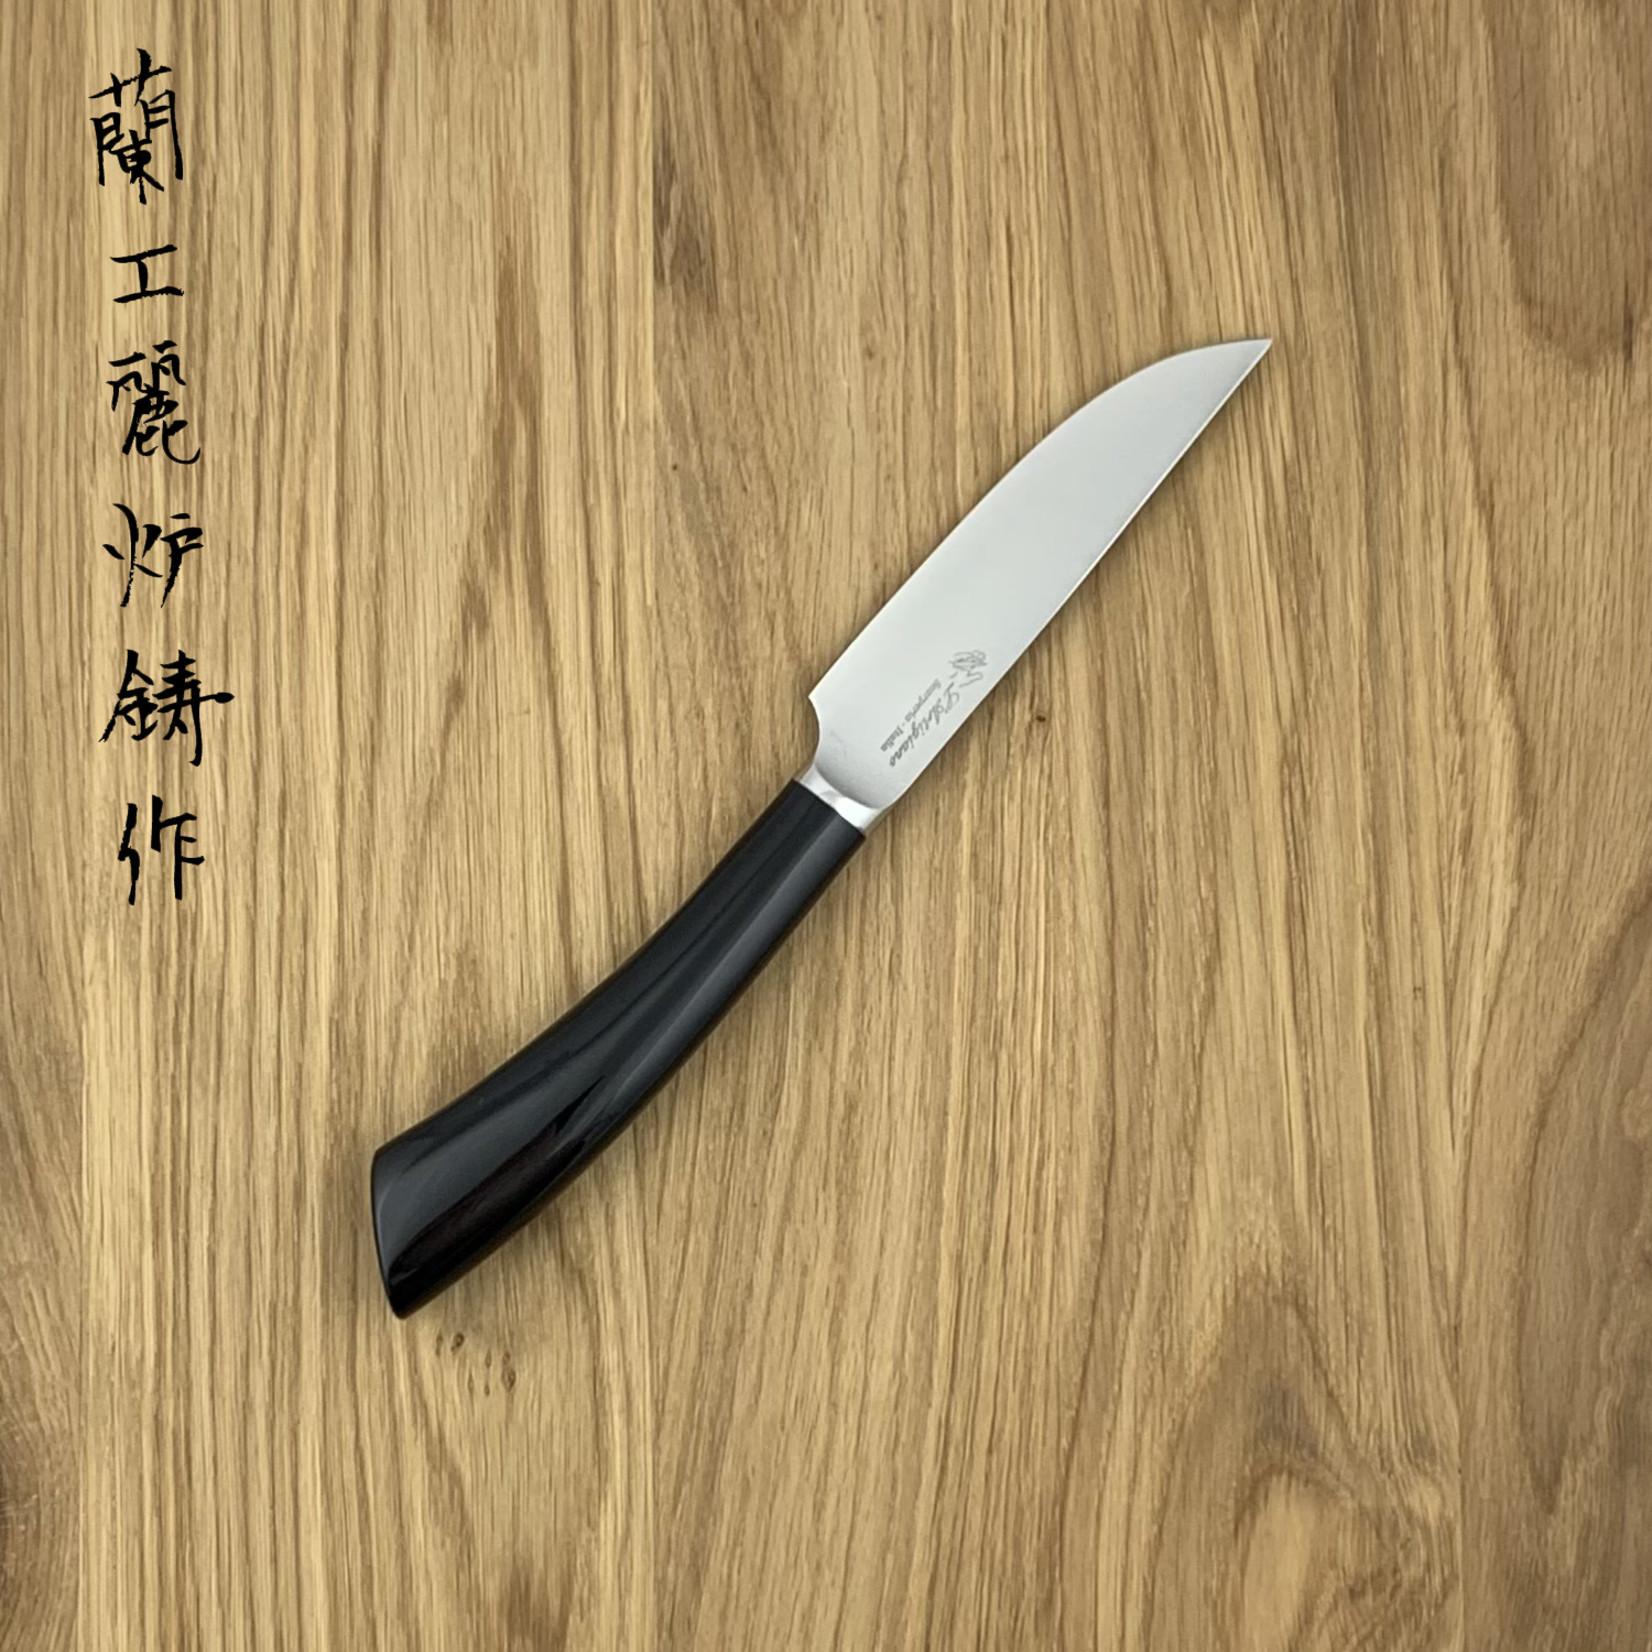 L'ARTIGIANO SCARPERIA Rustico steak knife plastic black